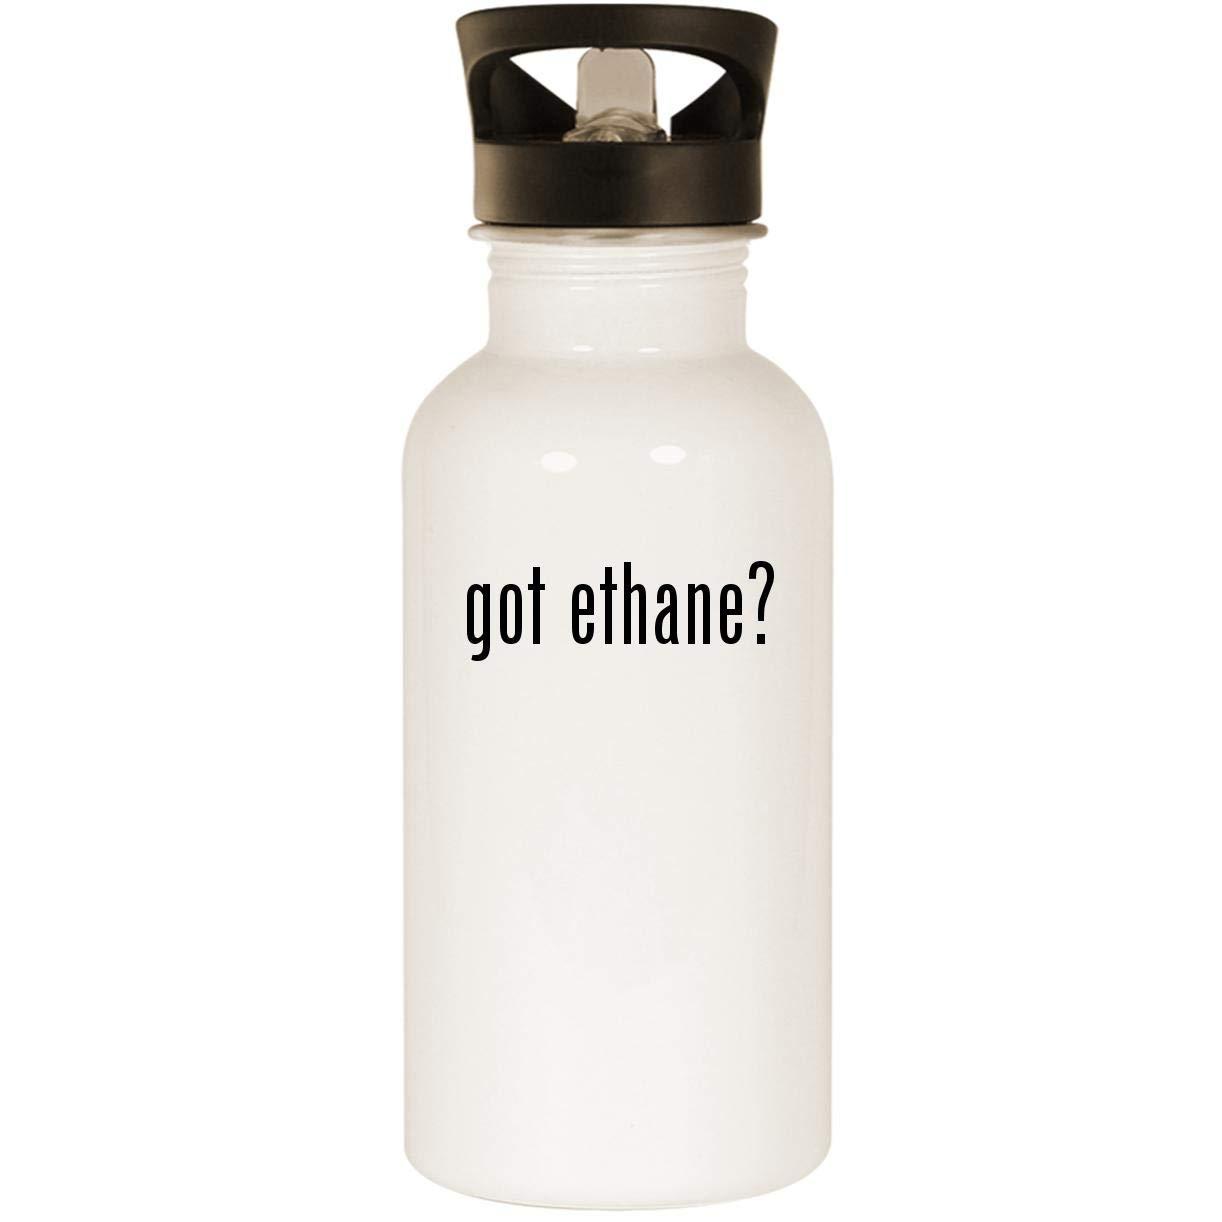 got ethane? - Stainless Steel 20oz Road Ready Water Bottle, White